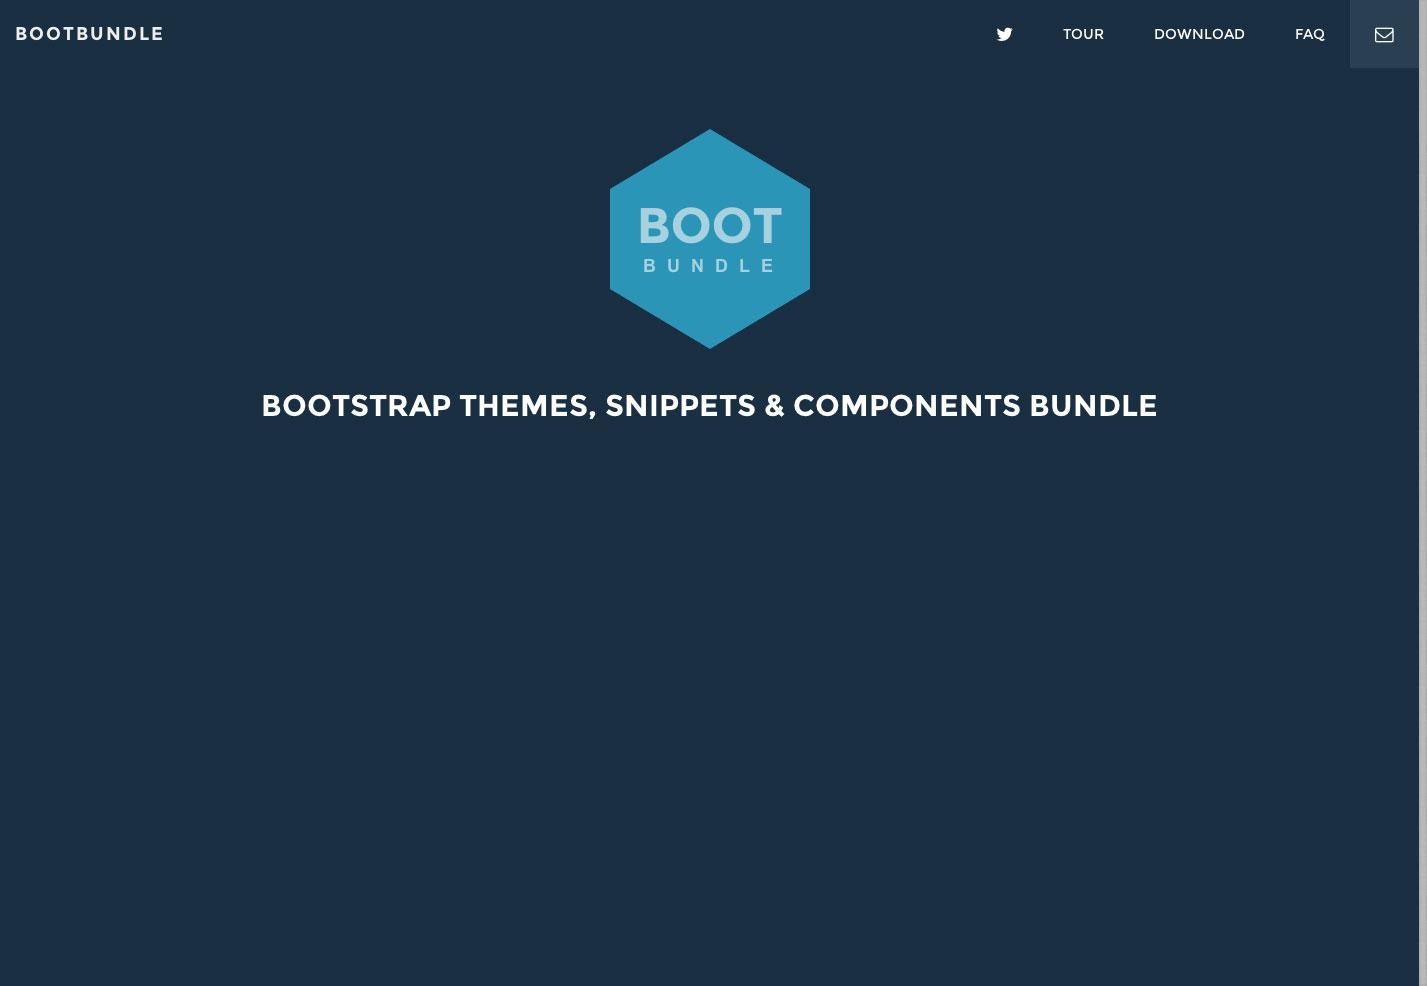 bootbundle